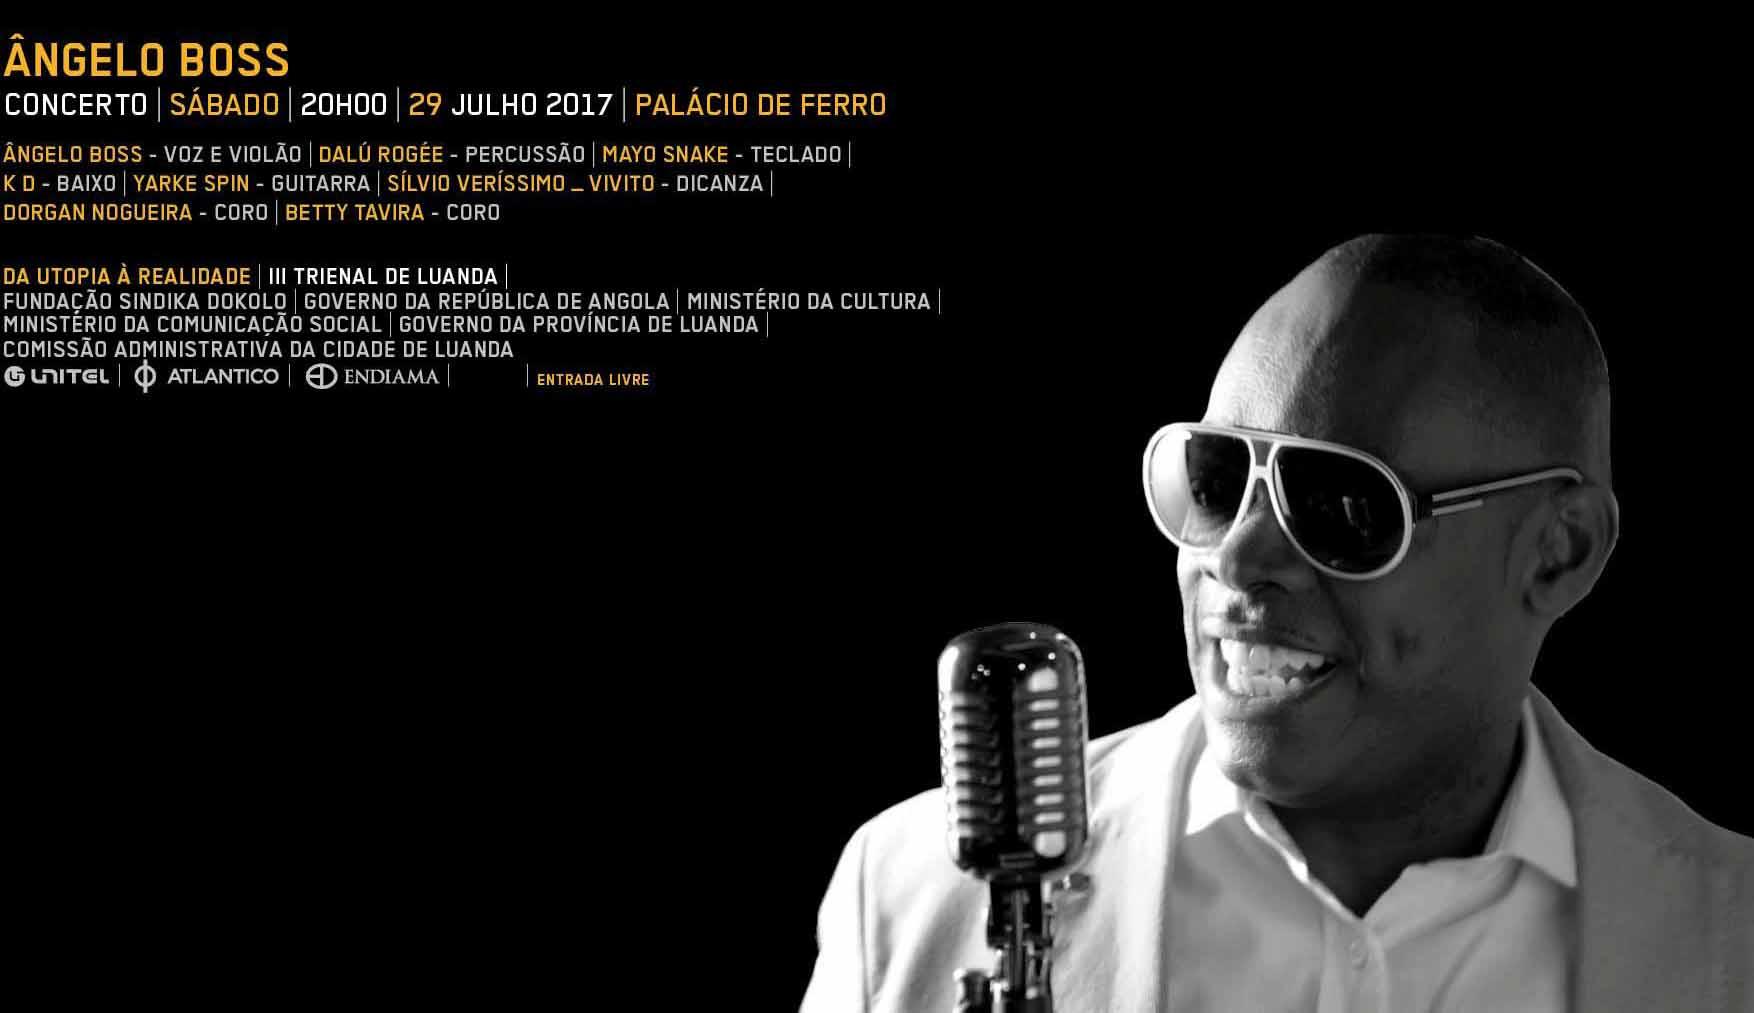 Ângelo Boss estreia-se este sábado na III Trienal de Luanda